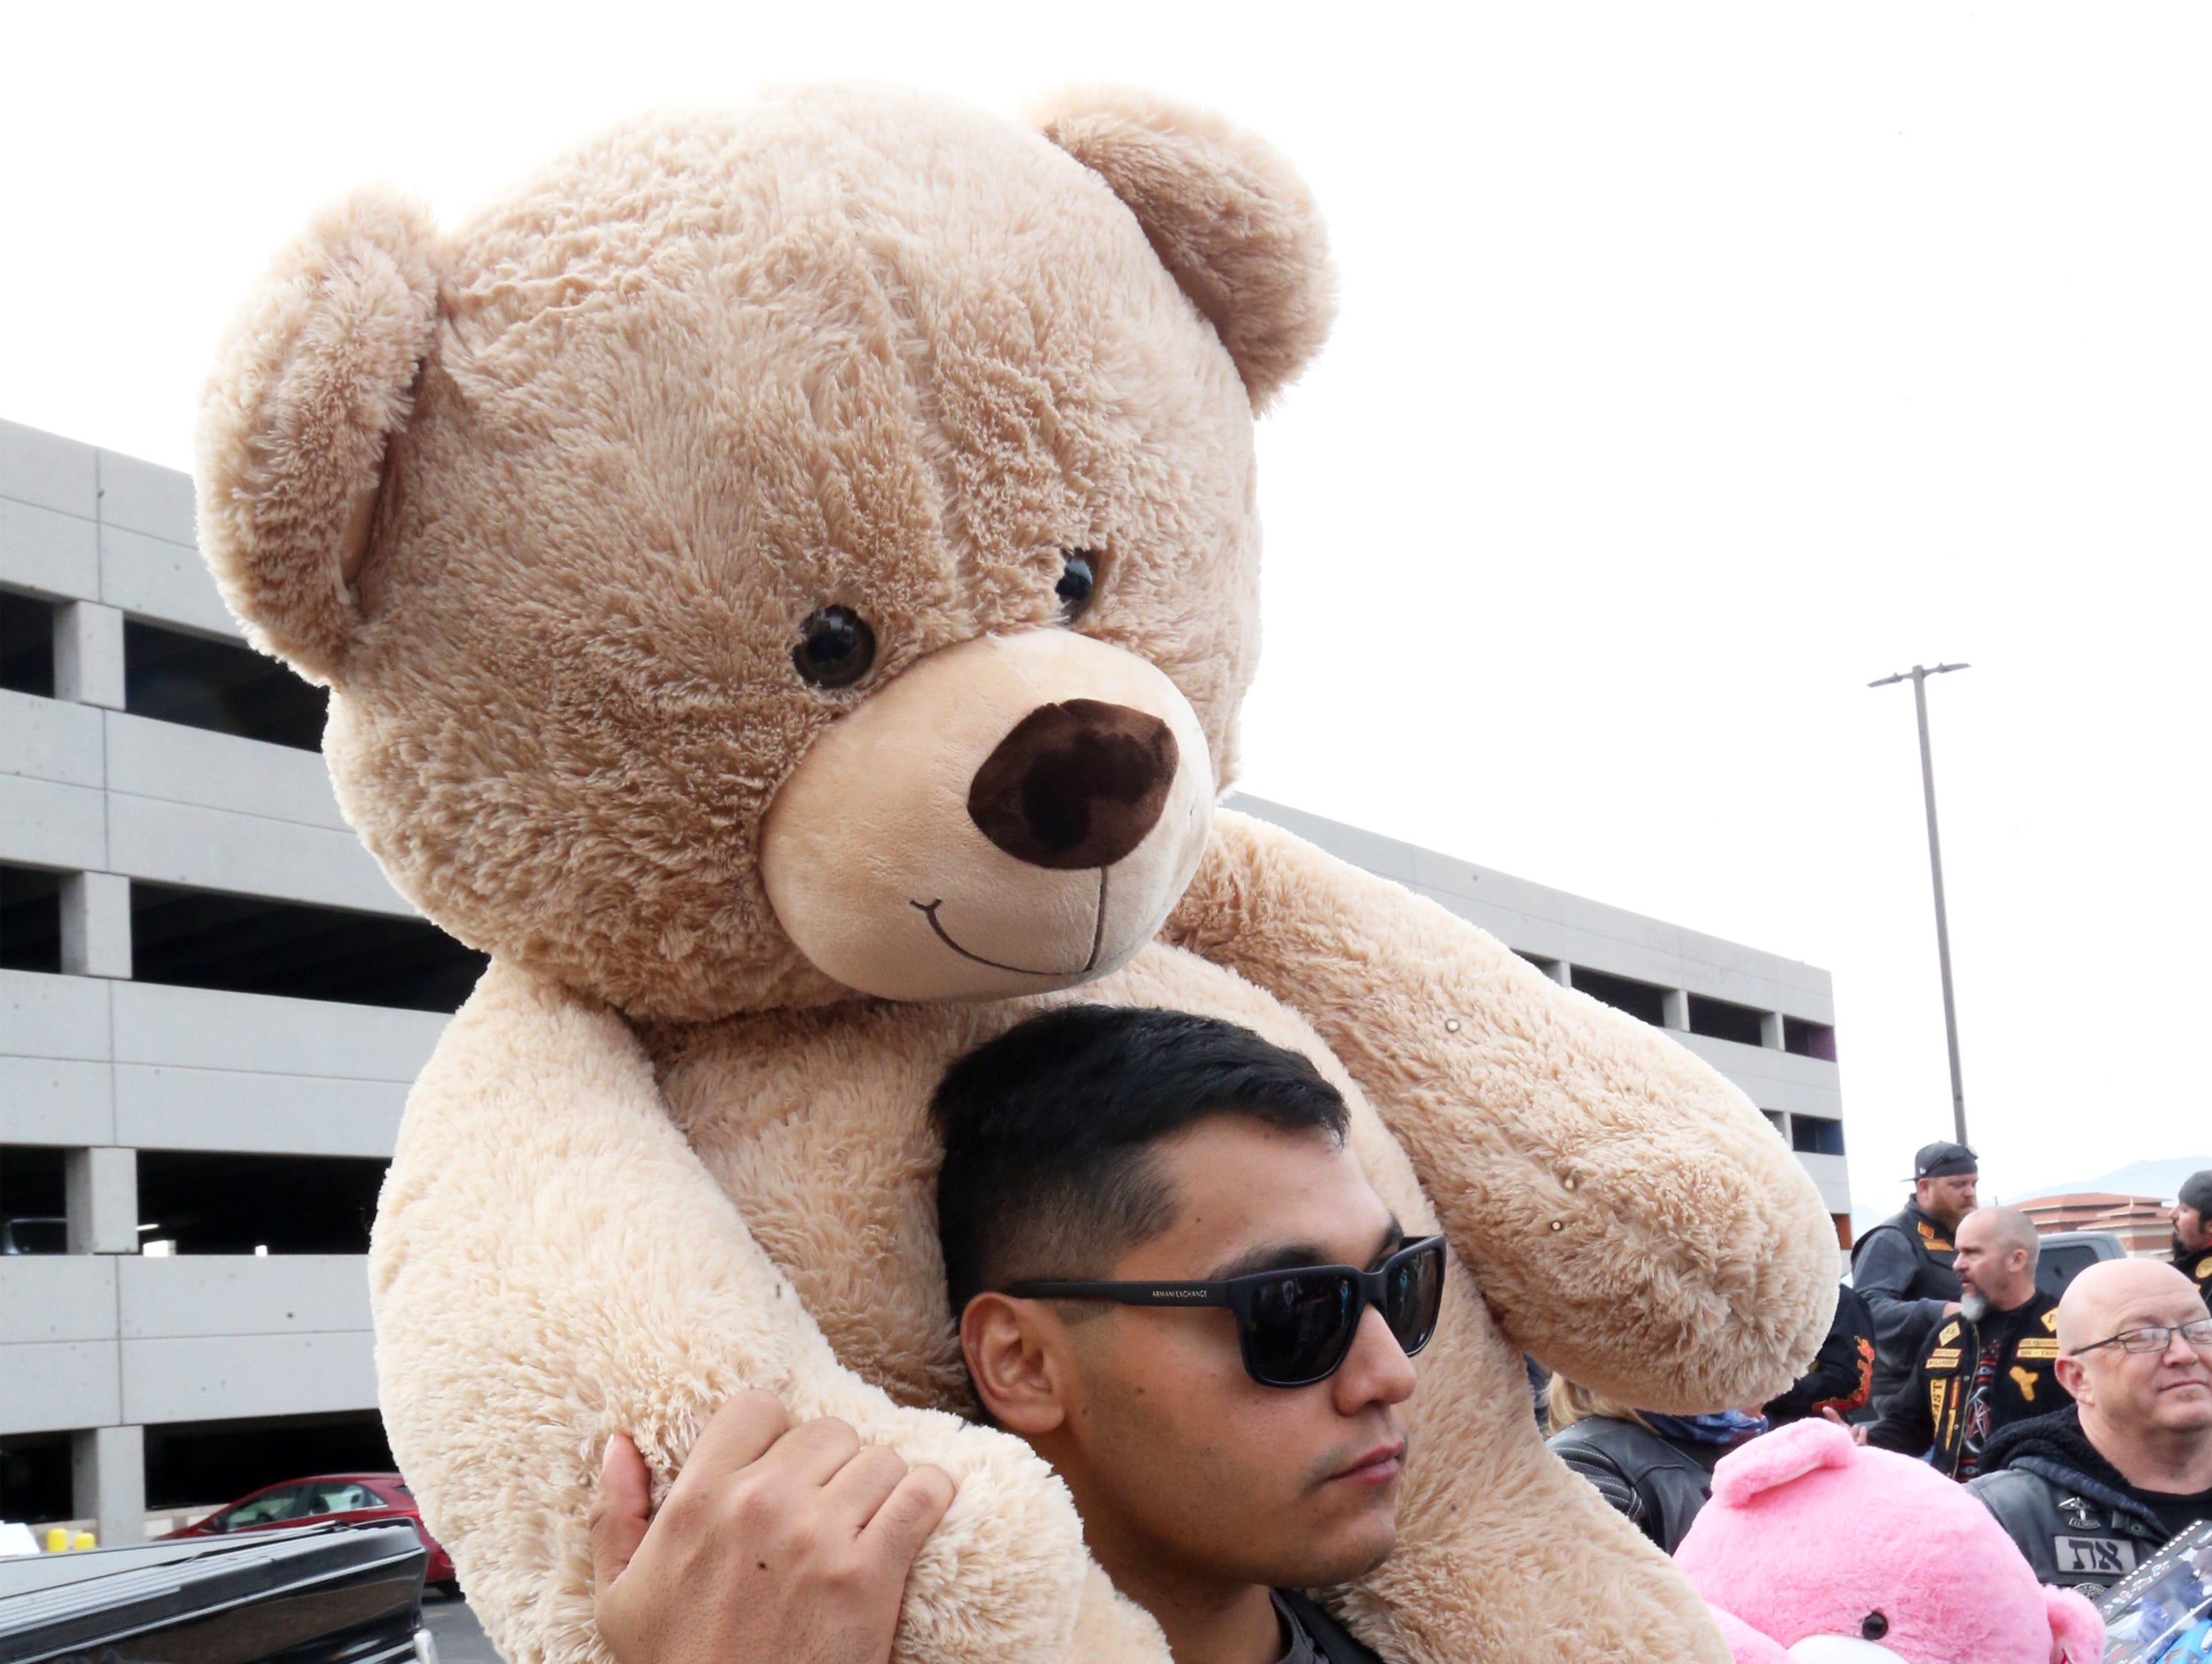 Joseph Saucedo carries in a giant stuffed bear Tuesday.